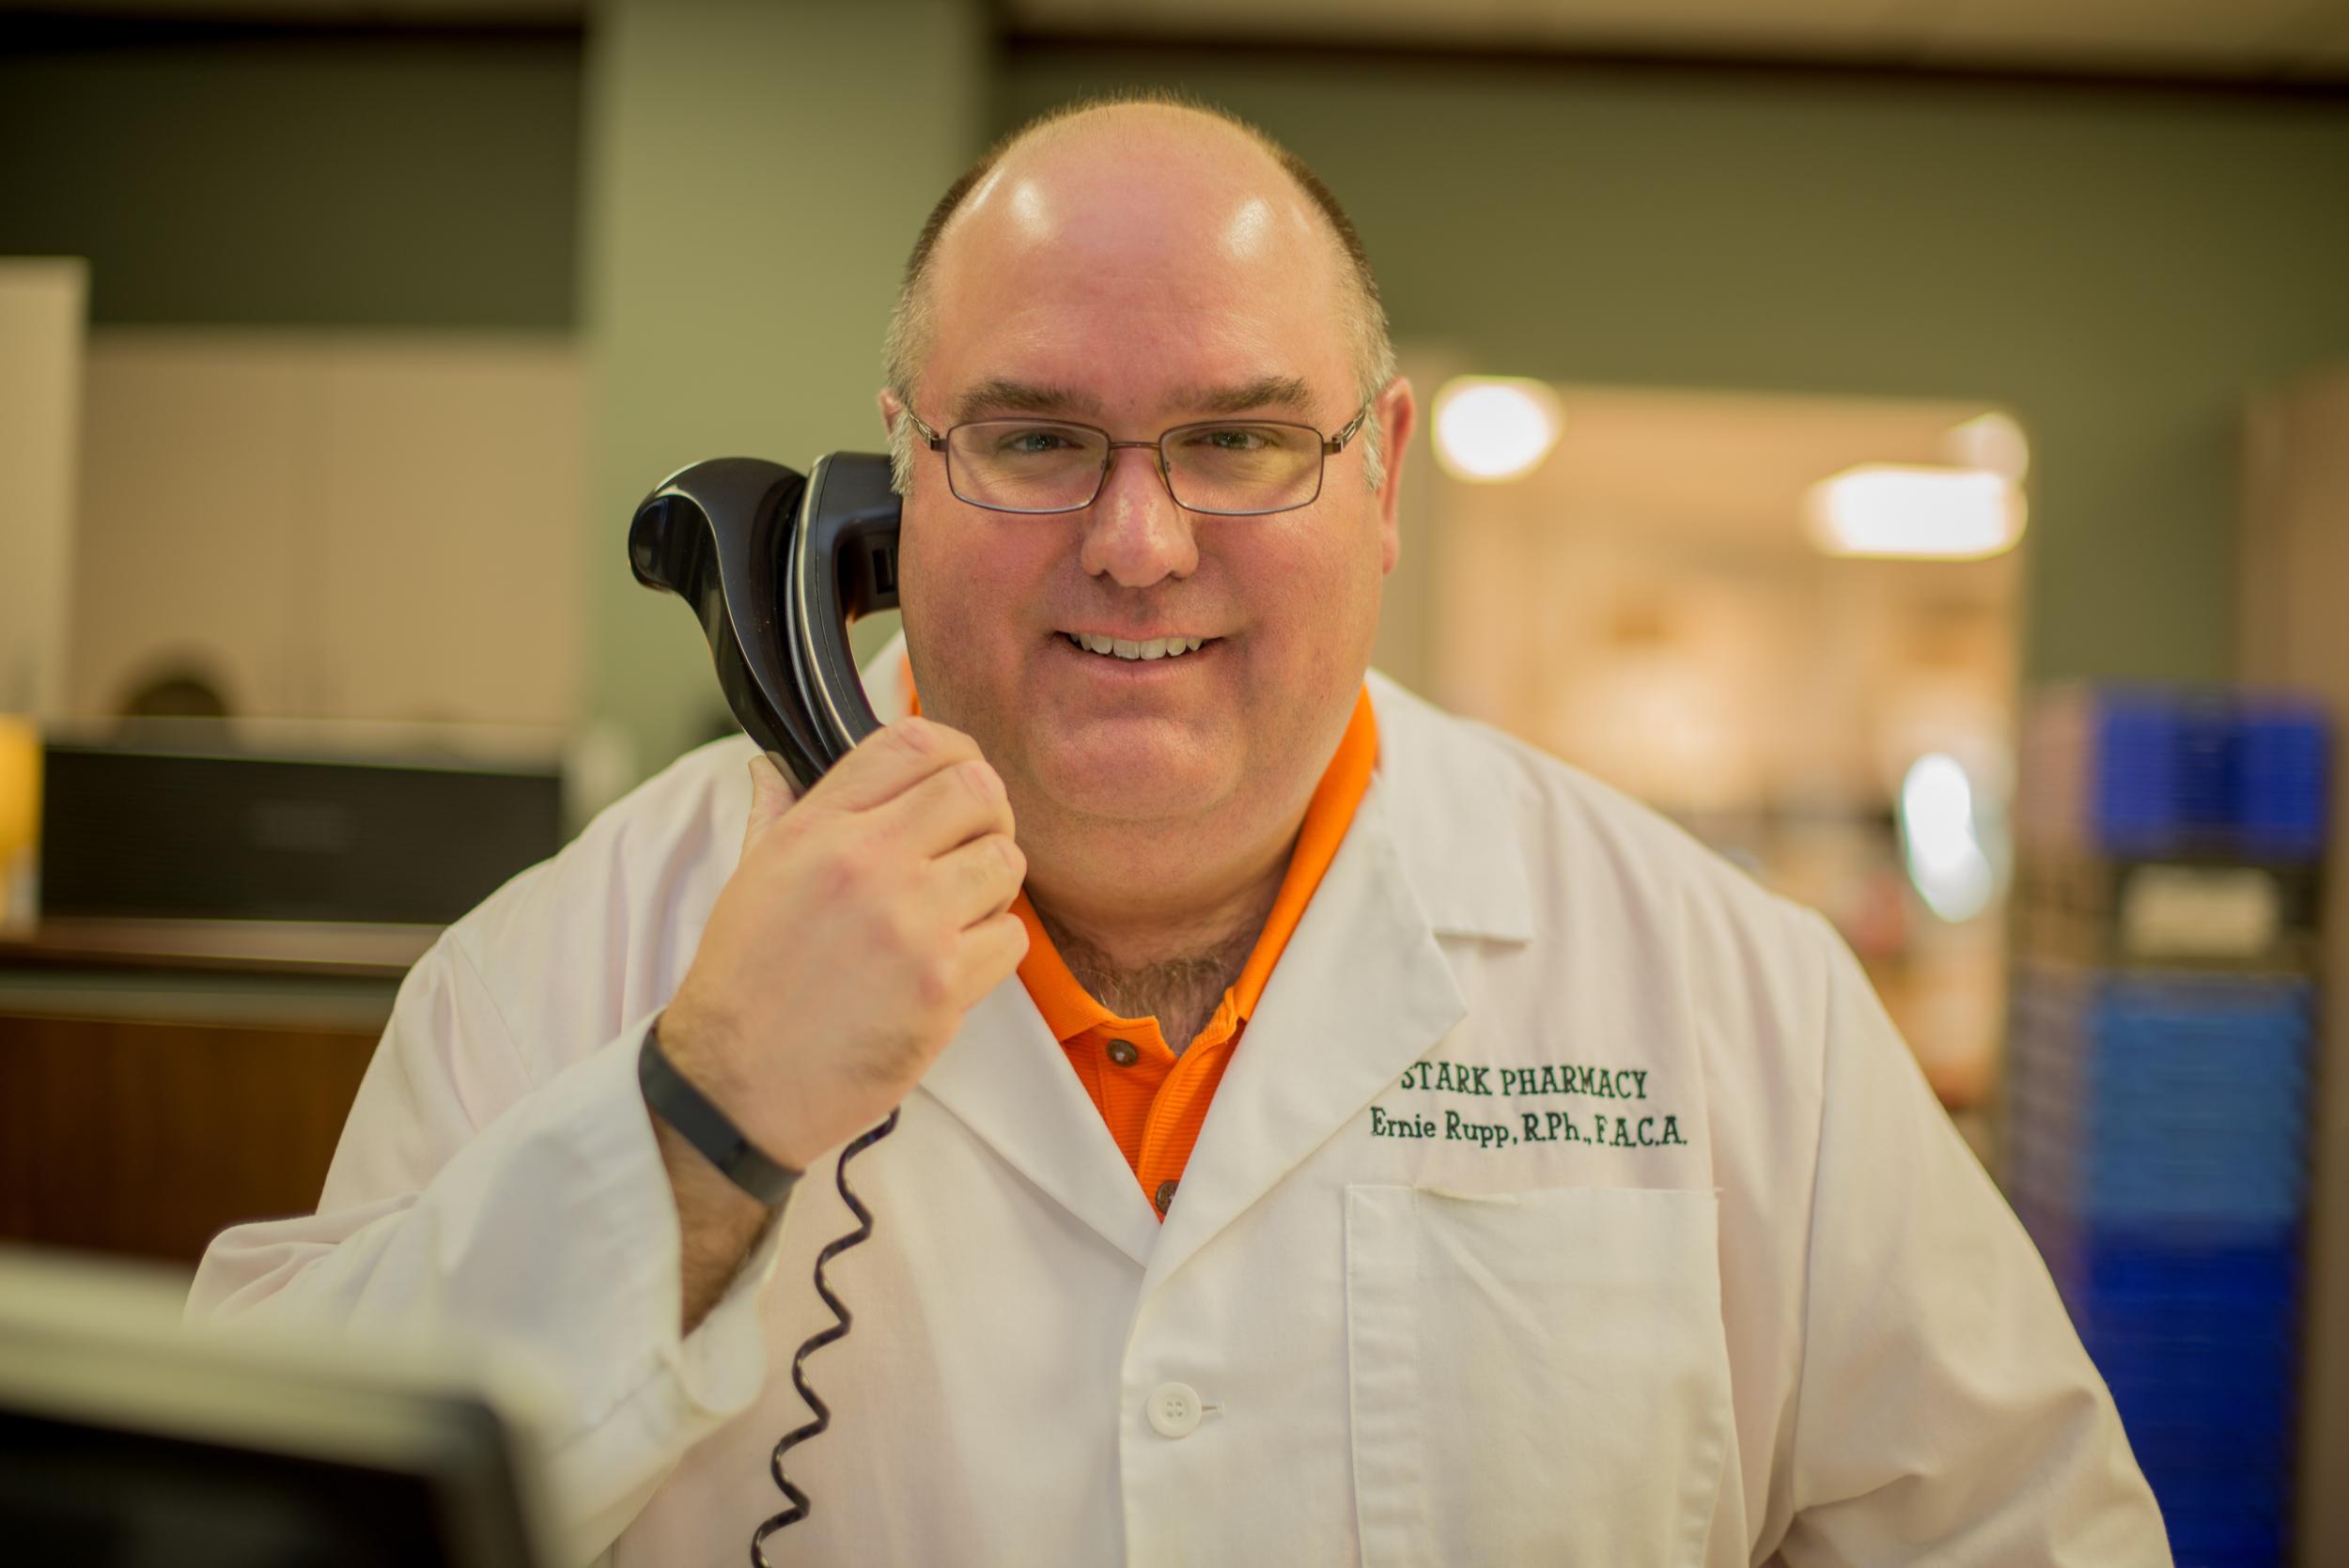 Ernie Rupp  Pharmacist